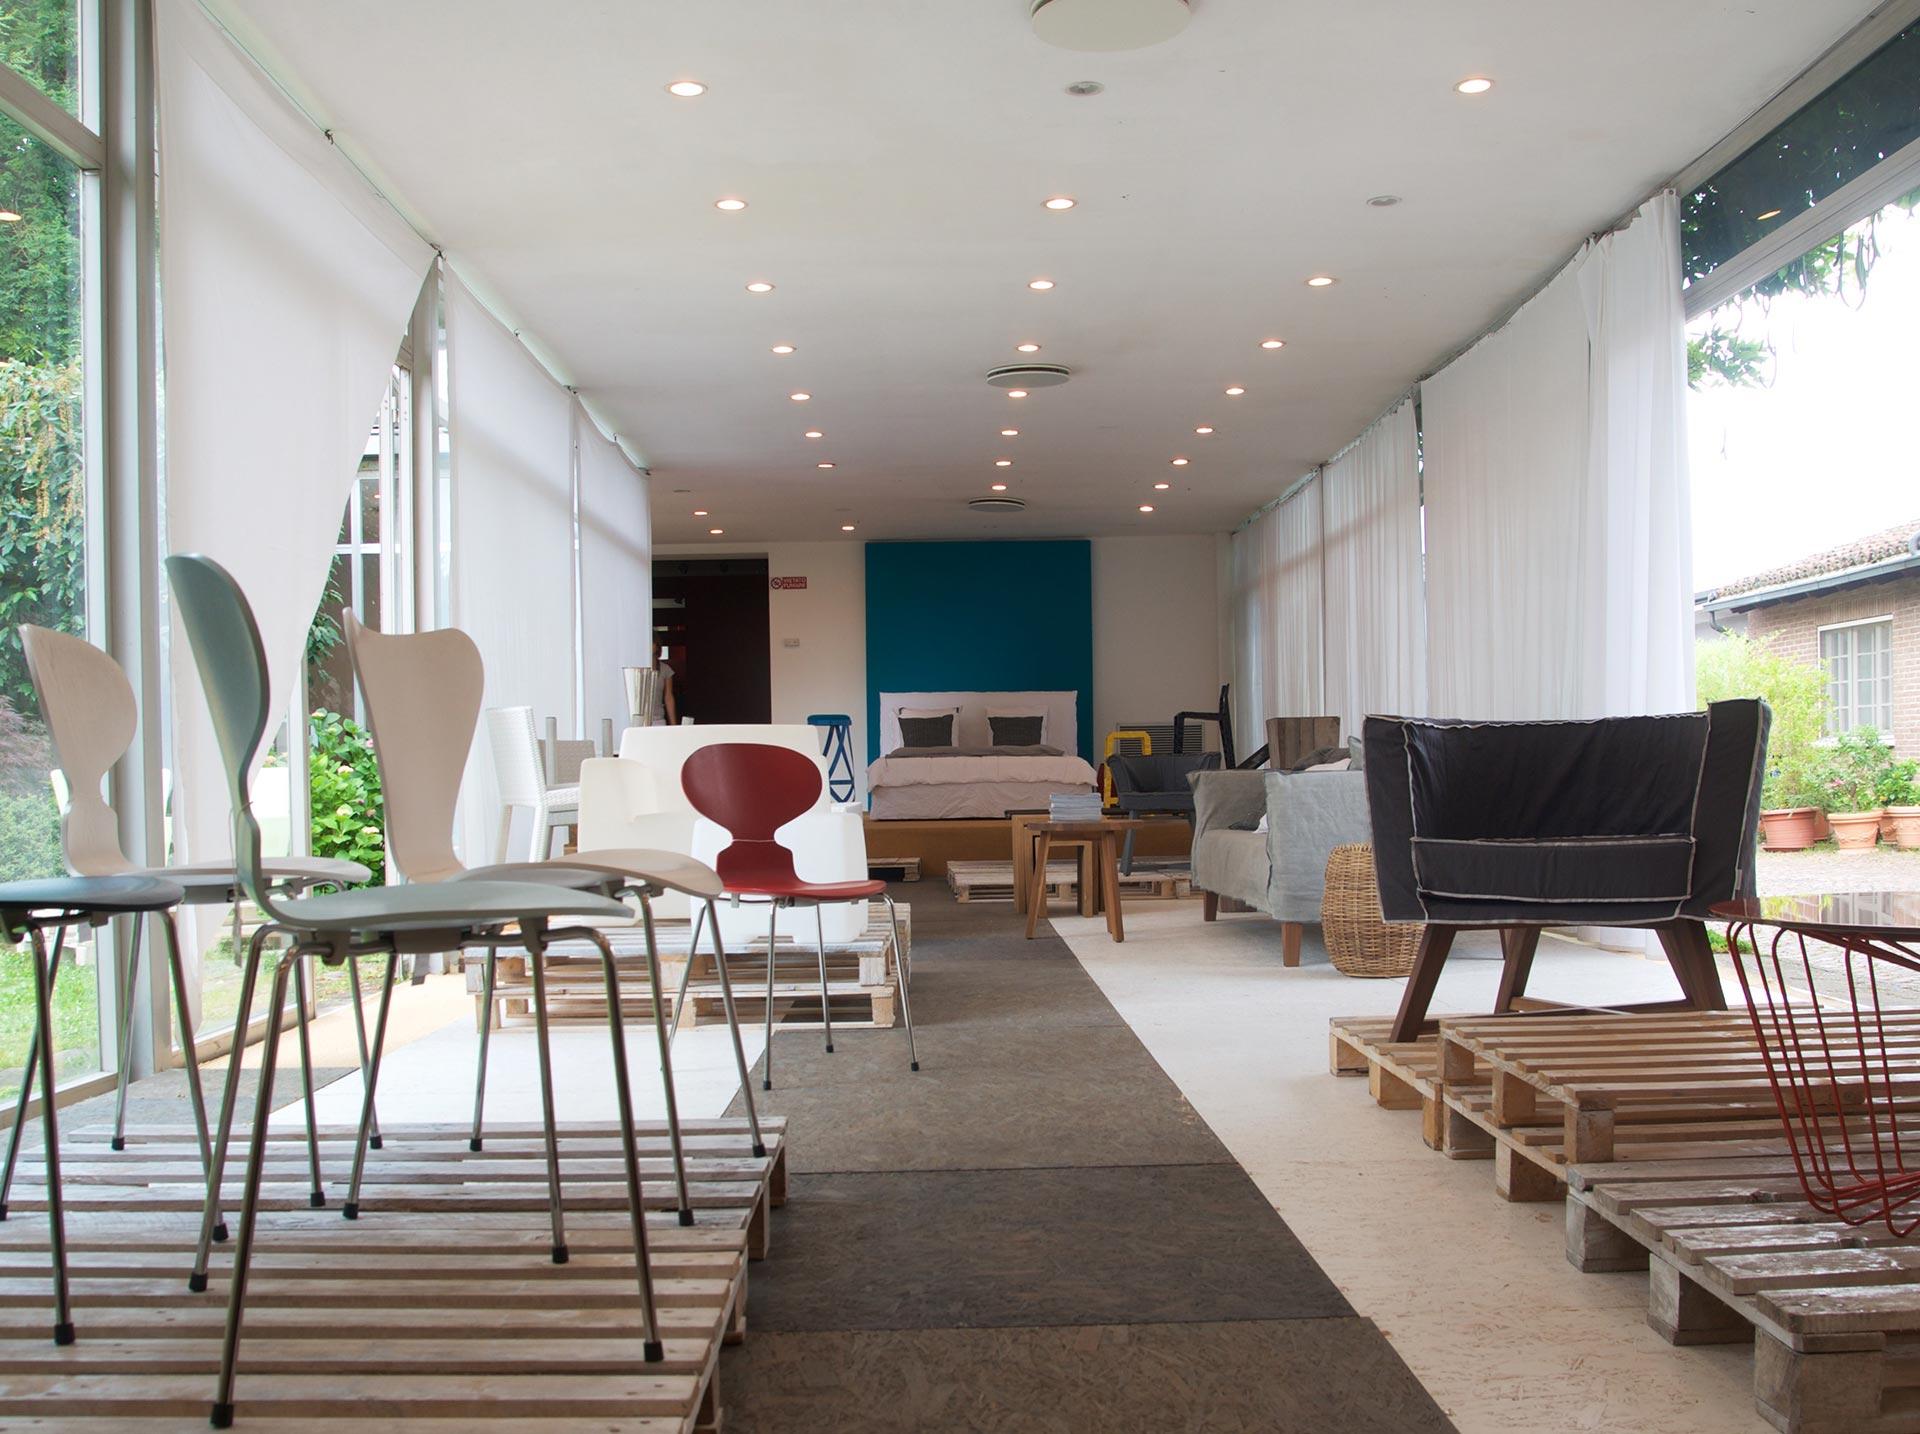 design and furniture shop showroom alessandria piedmont